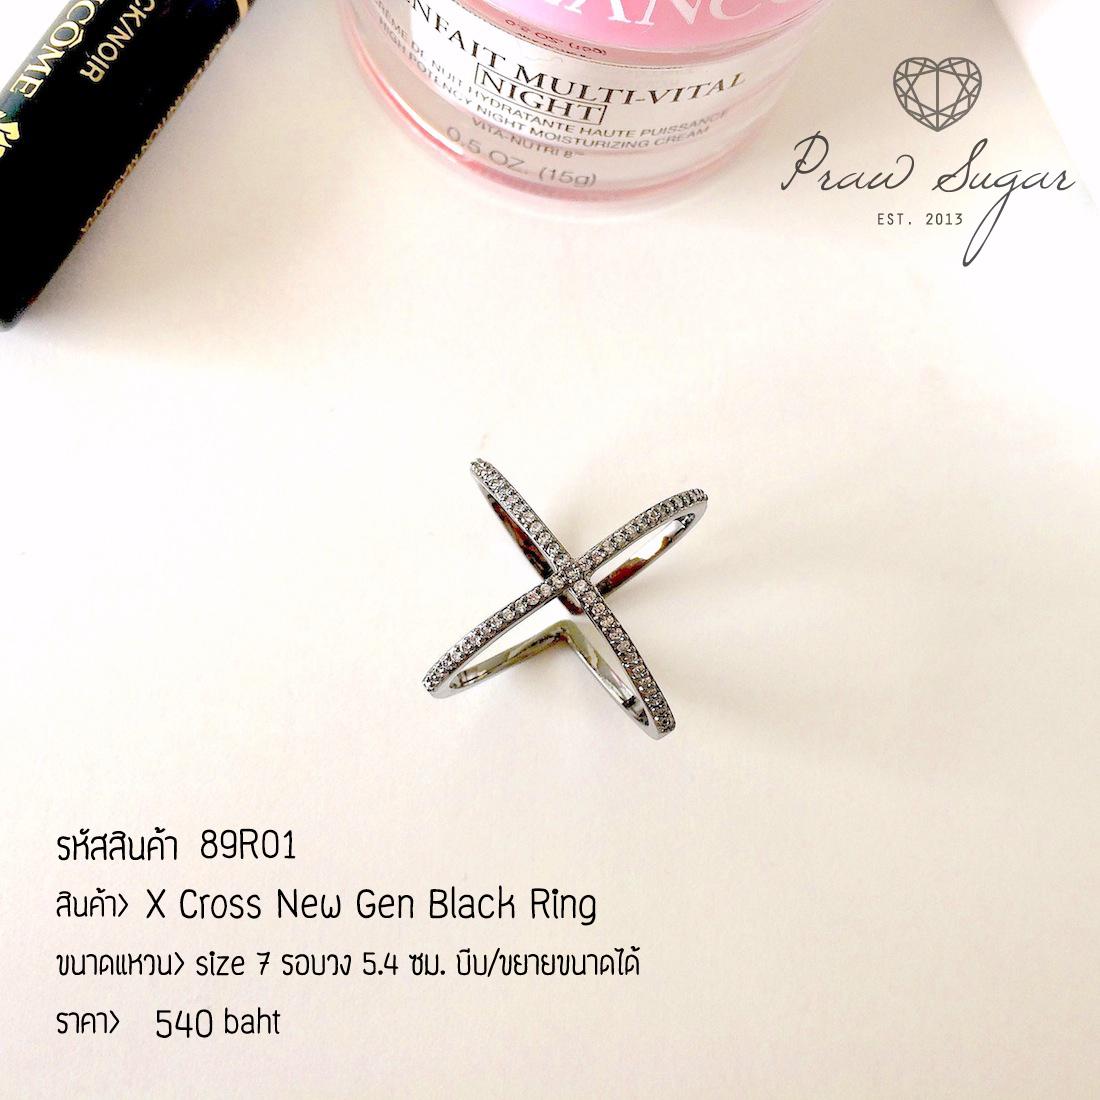 X cross New Gen Black Ring